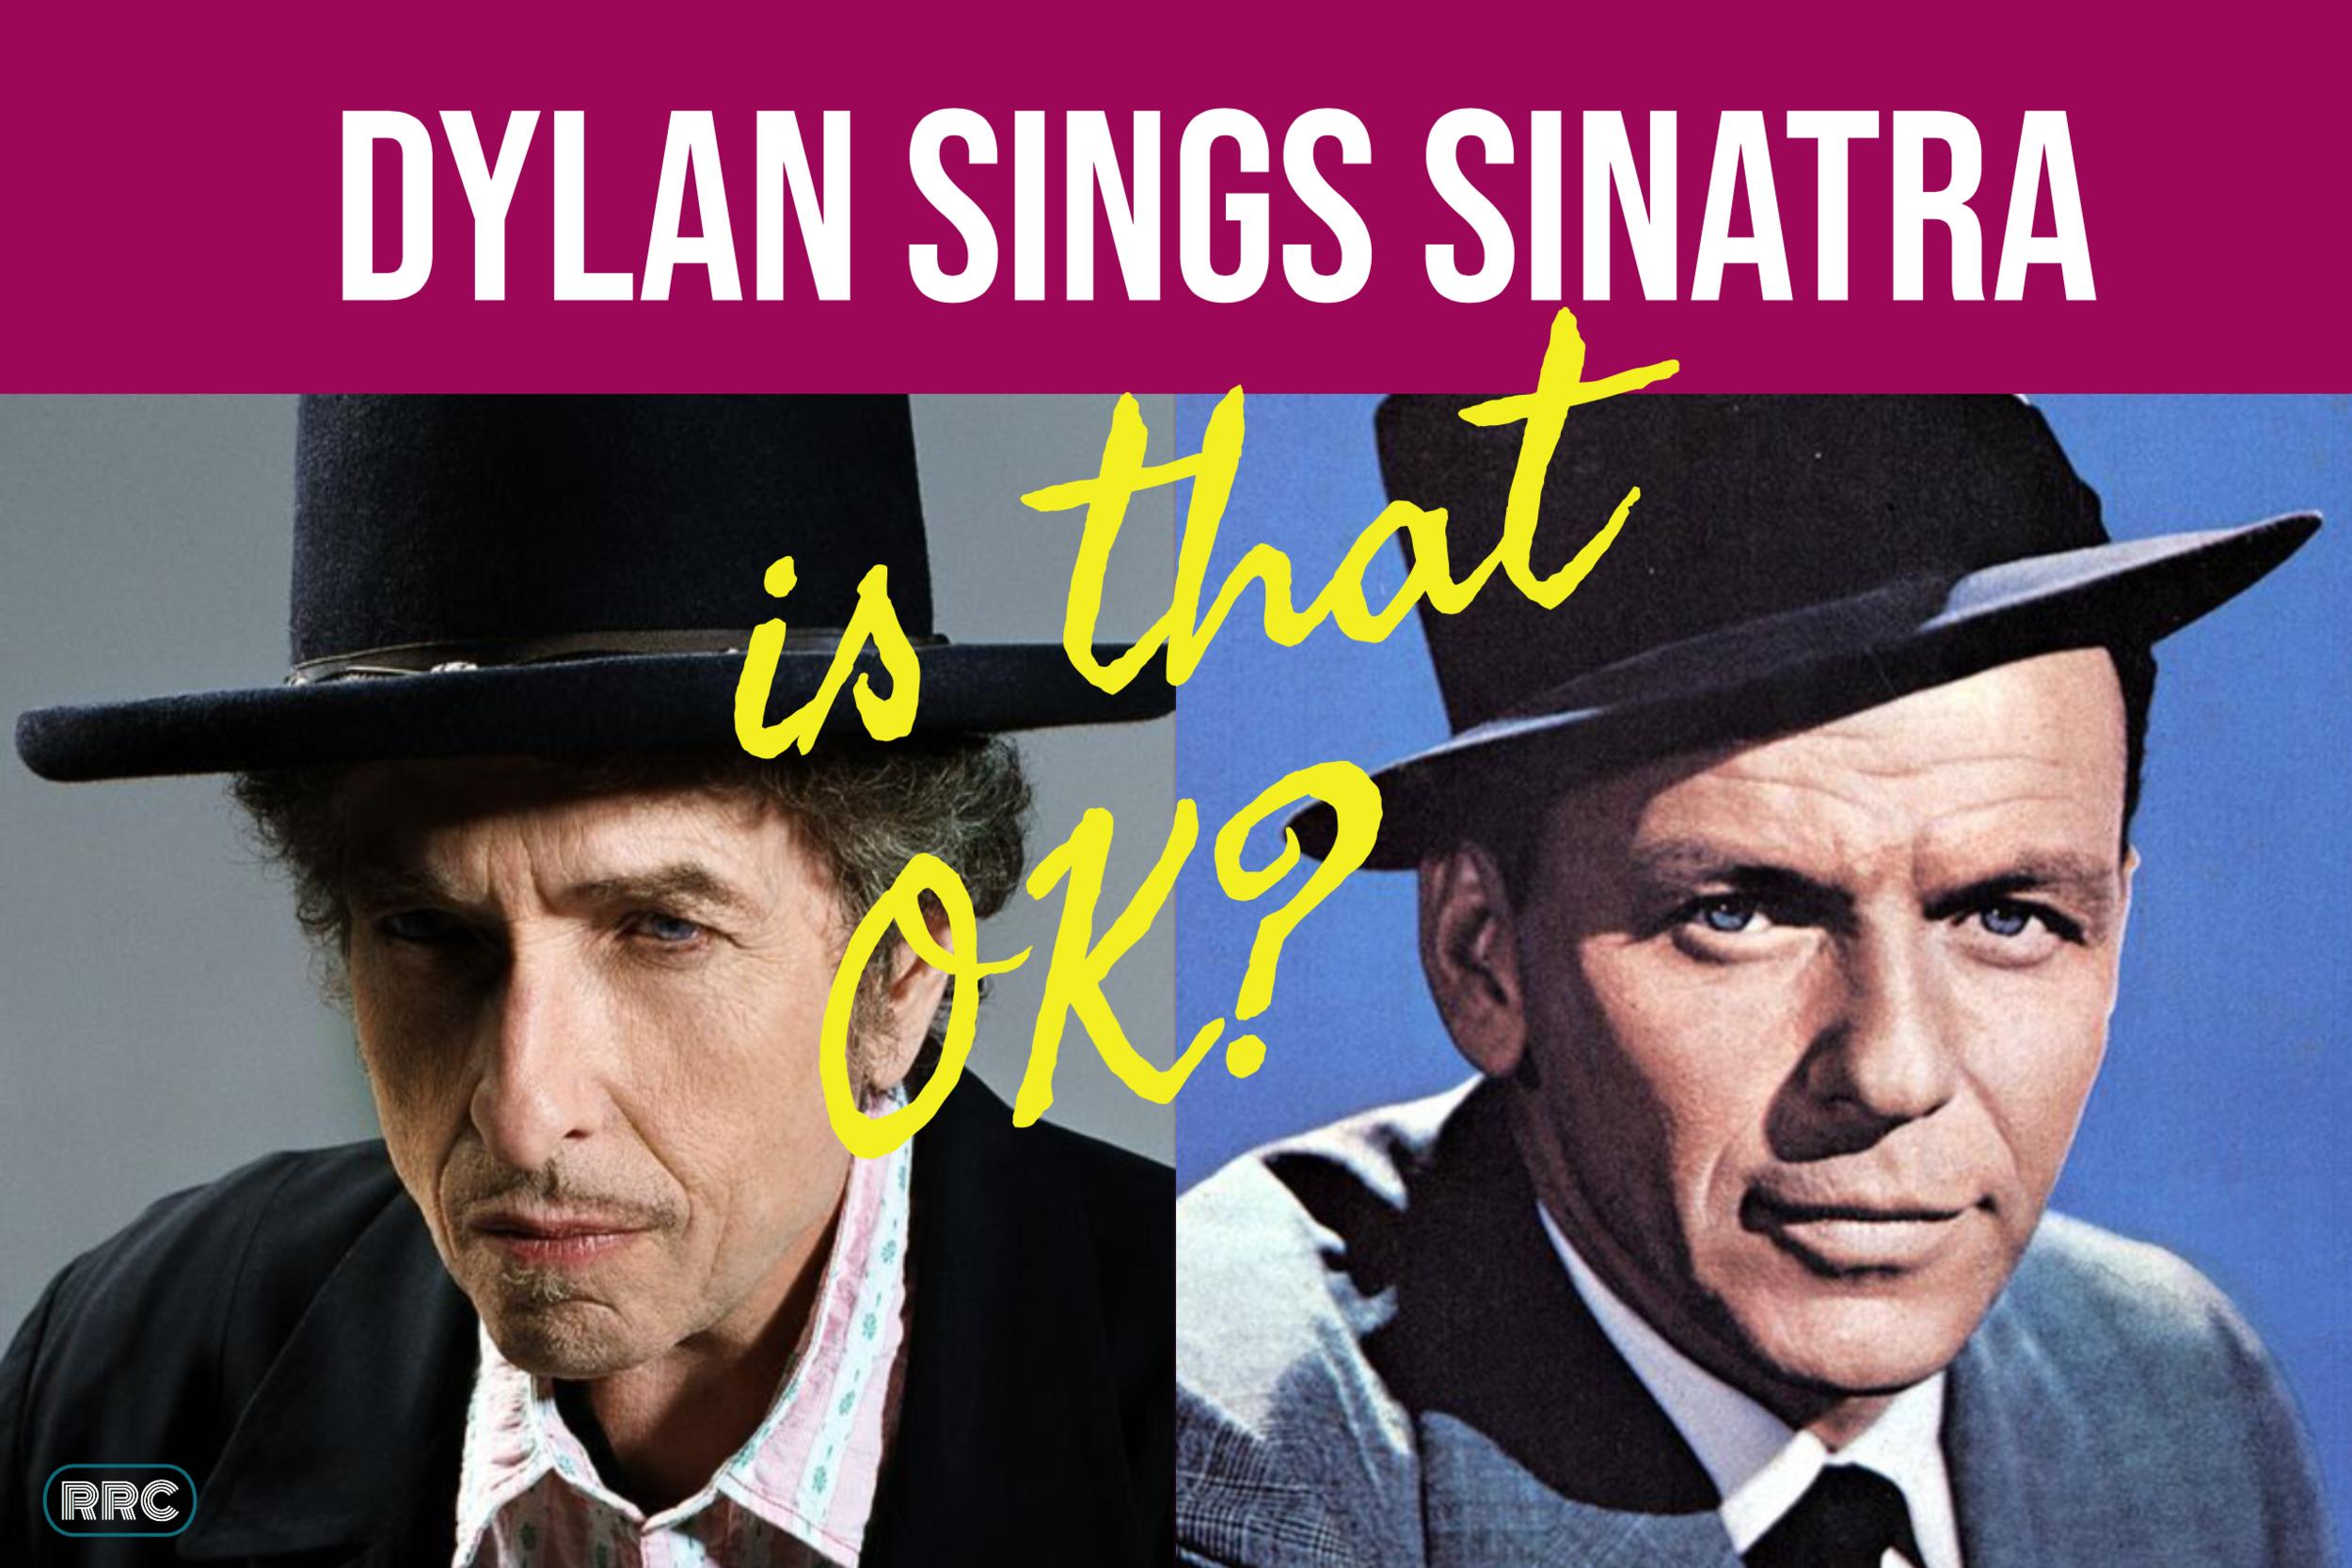 RRC-Dylan Sinatra - LS.png